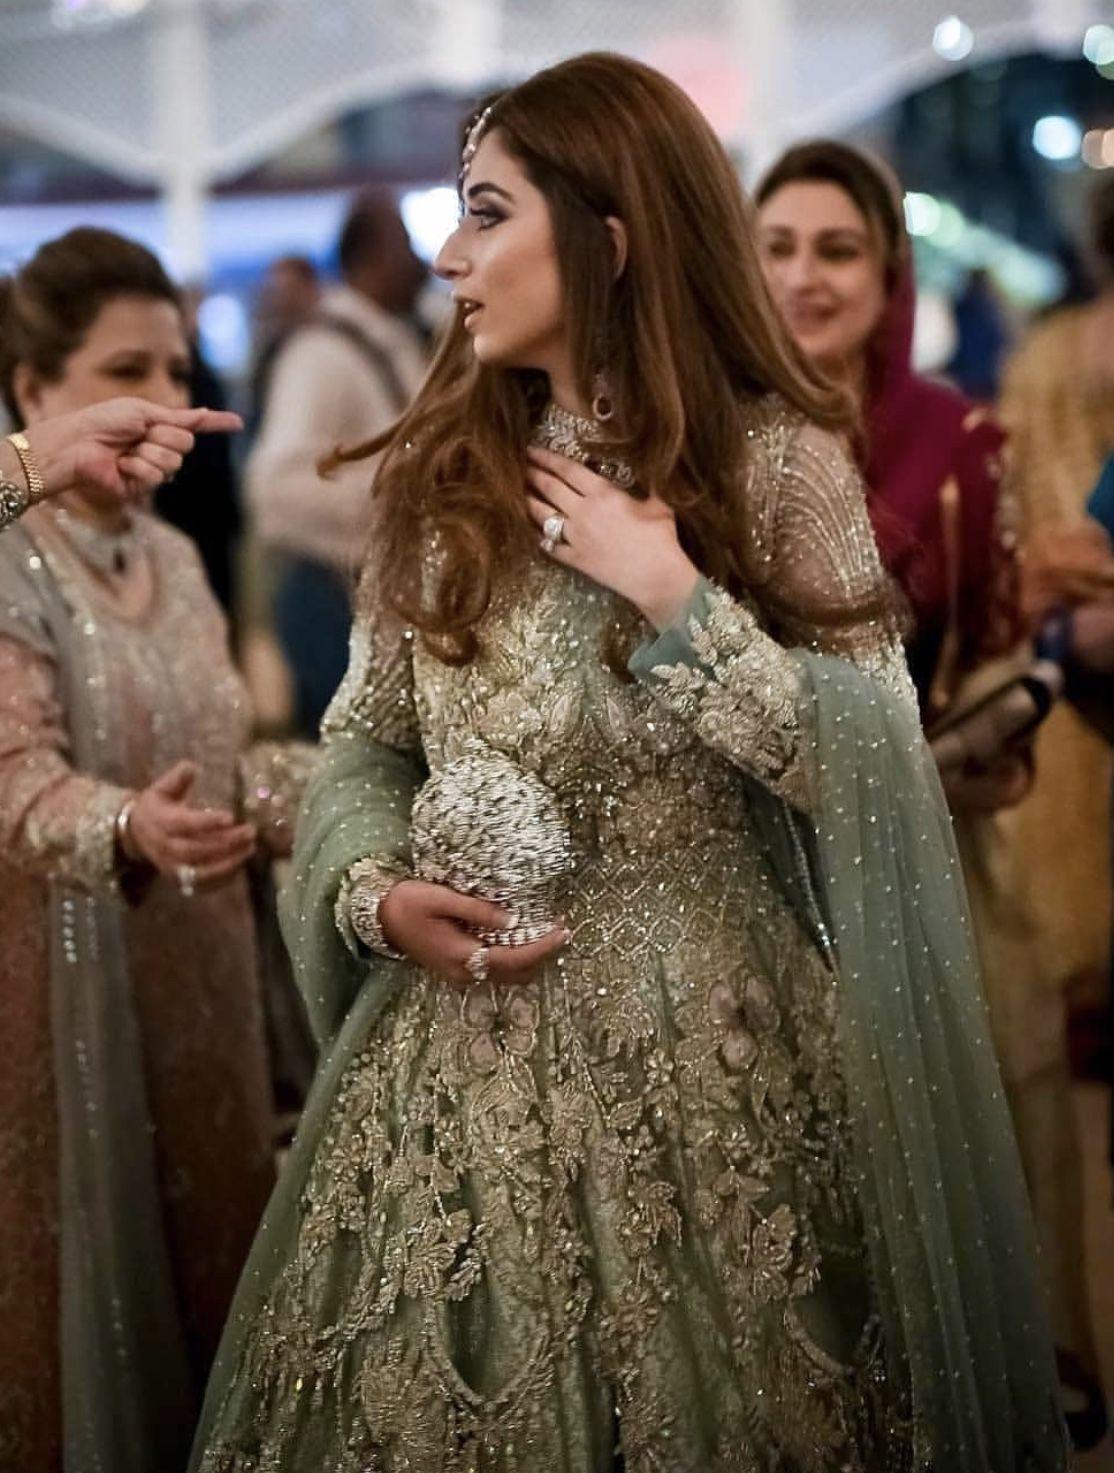 Pakistani bride at her sangeet / gaana night wearing suffuse by